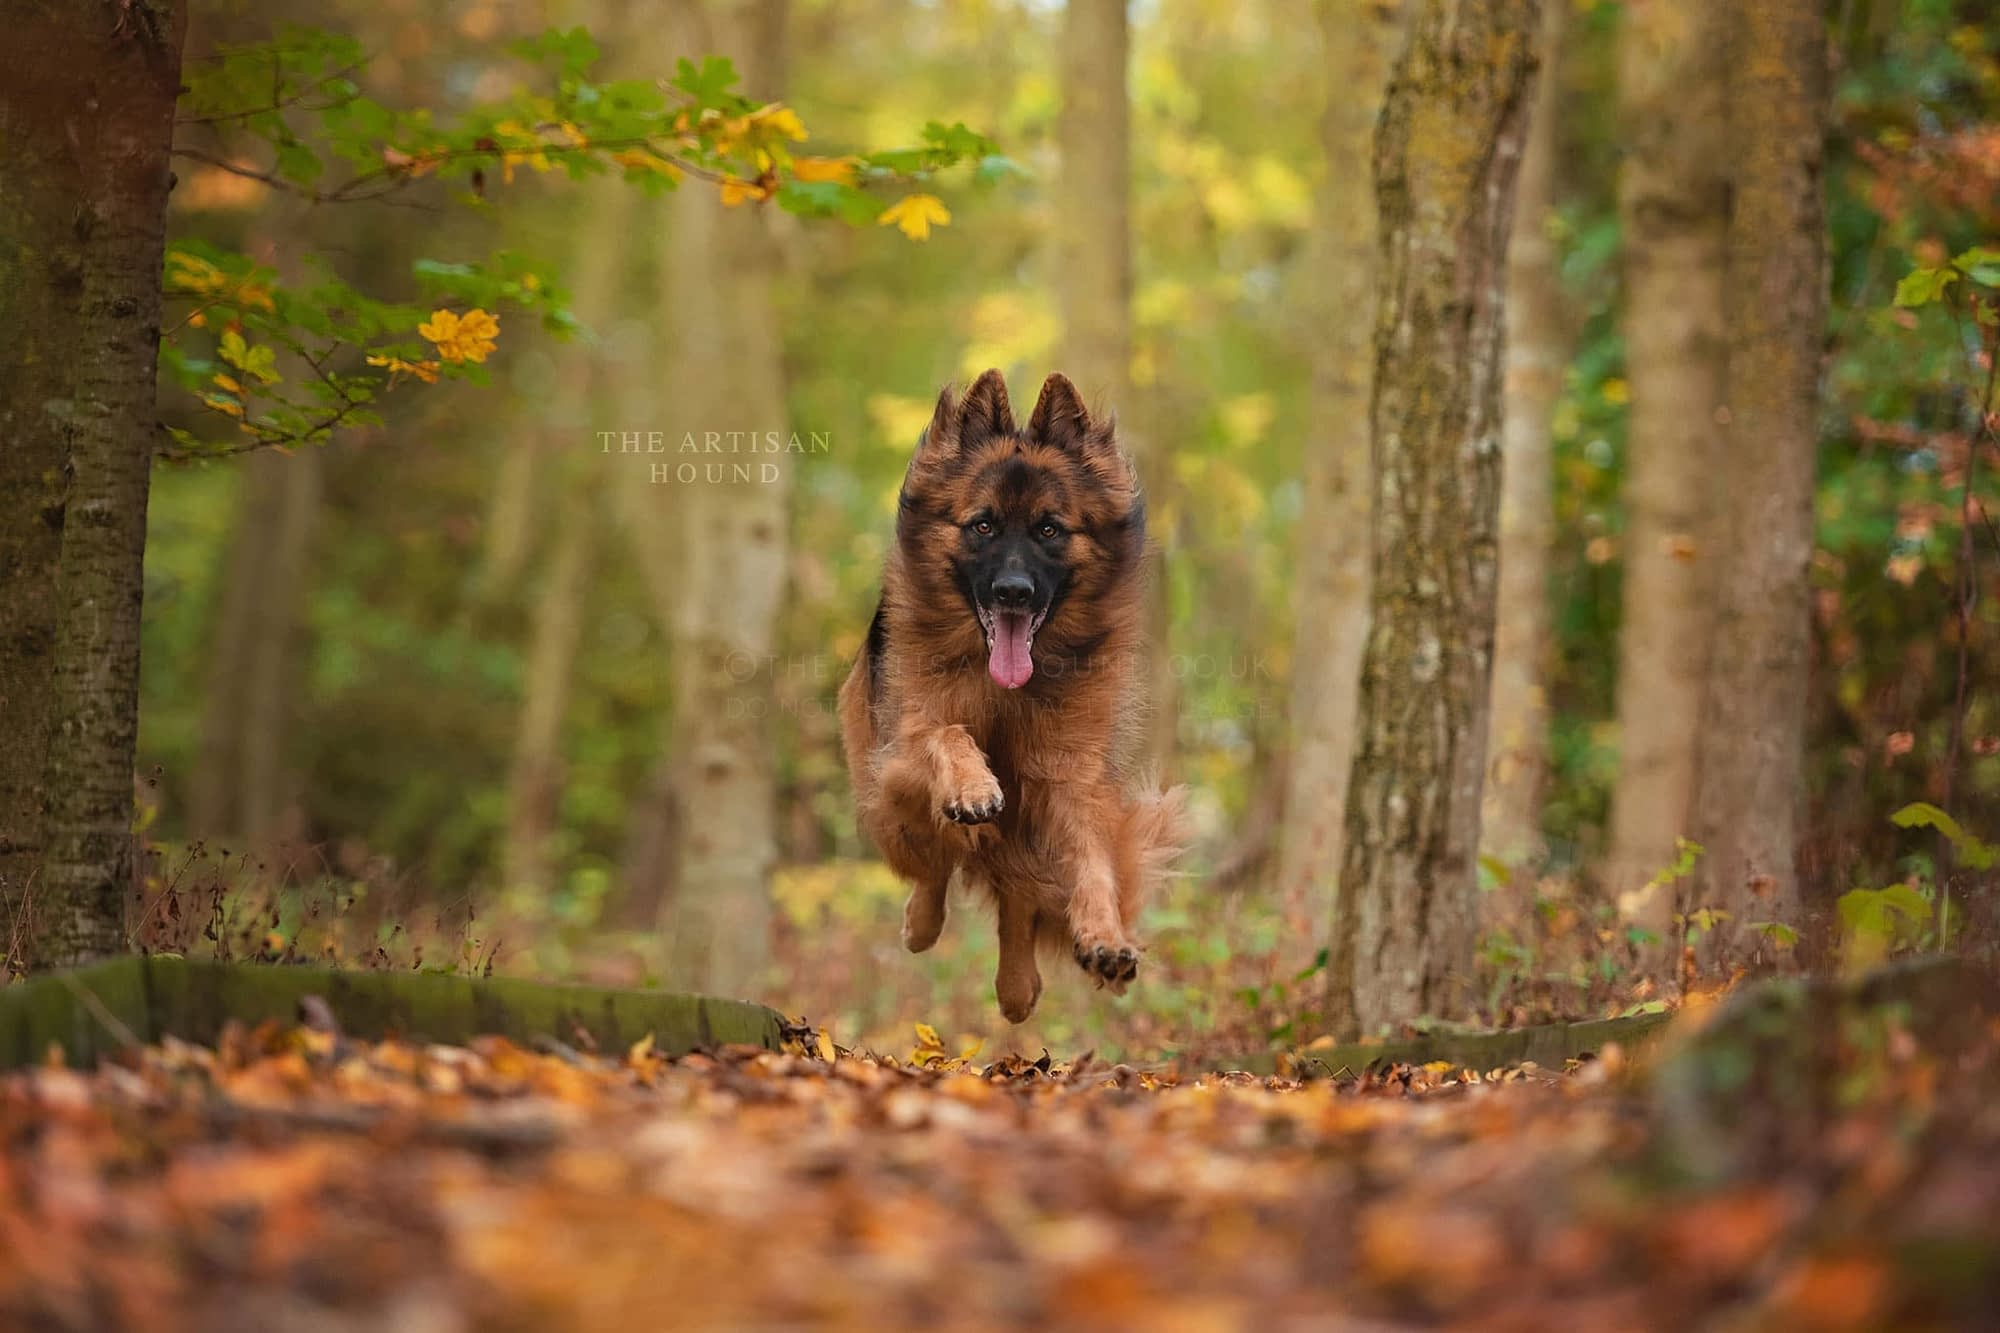 German Shepherd running through autumn leaves